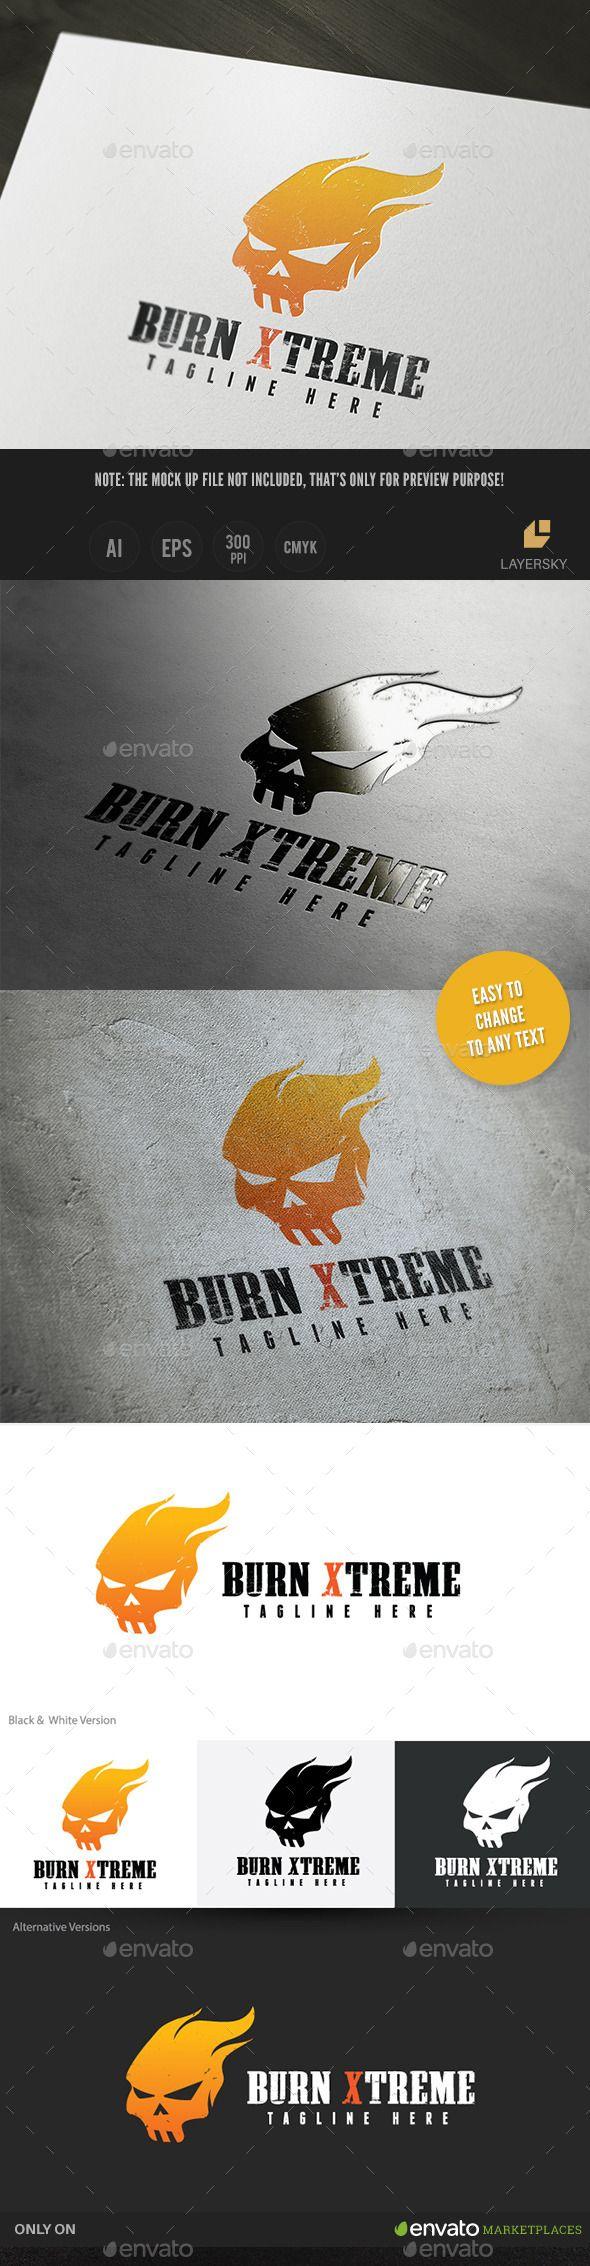 Buren Extreme Logo Template Vector EPS, AI. Download here: http://graphicriver.net/item/buren-extreme/11386409?ref=ksioks